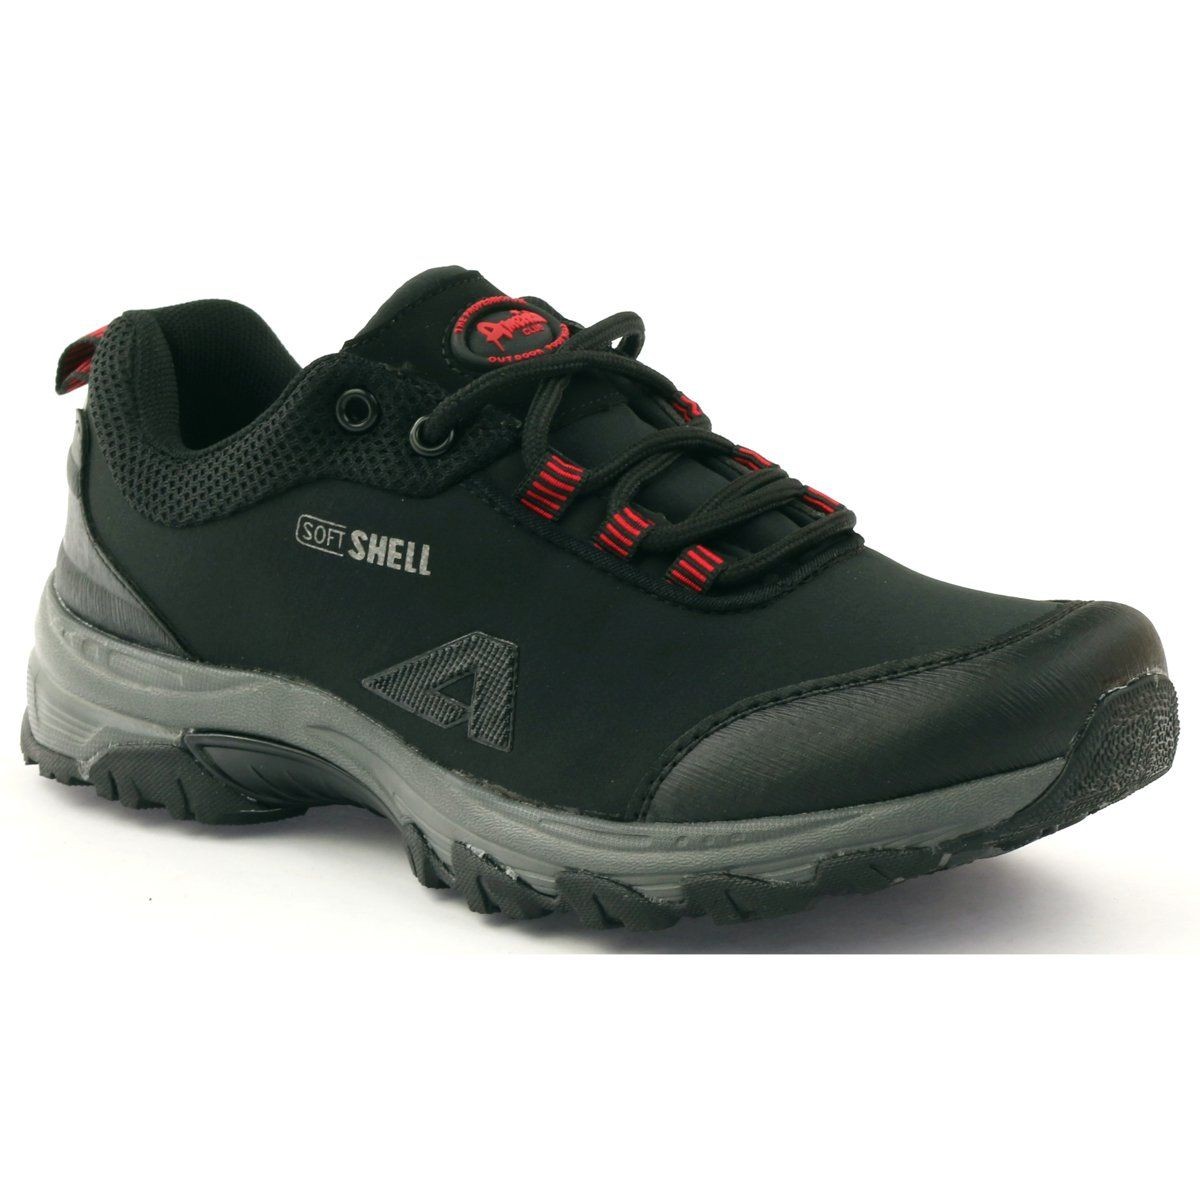 American Club American 1775 Buty Damskie Sportowe Softshell Czarne Czerwone Shoes Sketchers Sneakers Sneakers